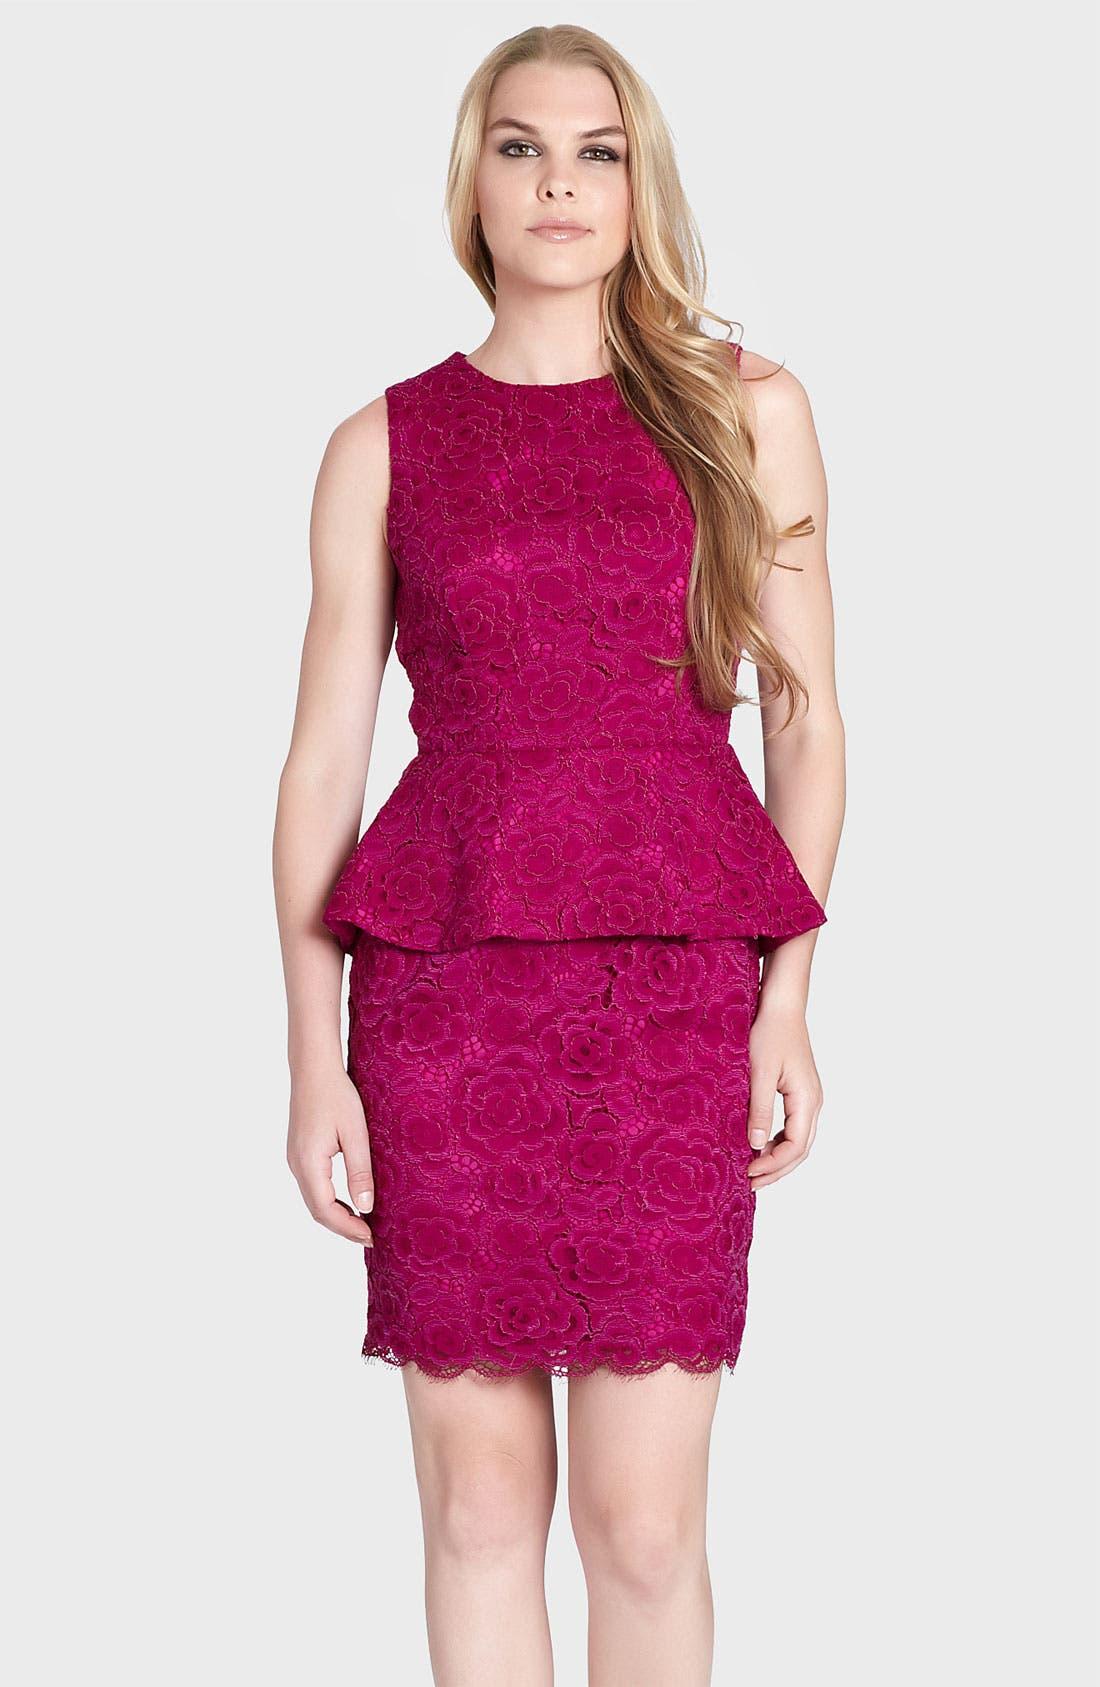 Alternate Image 1 Selected - Cynthia Steffe 'Camille' Peplum Lace Sheath Dress